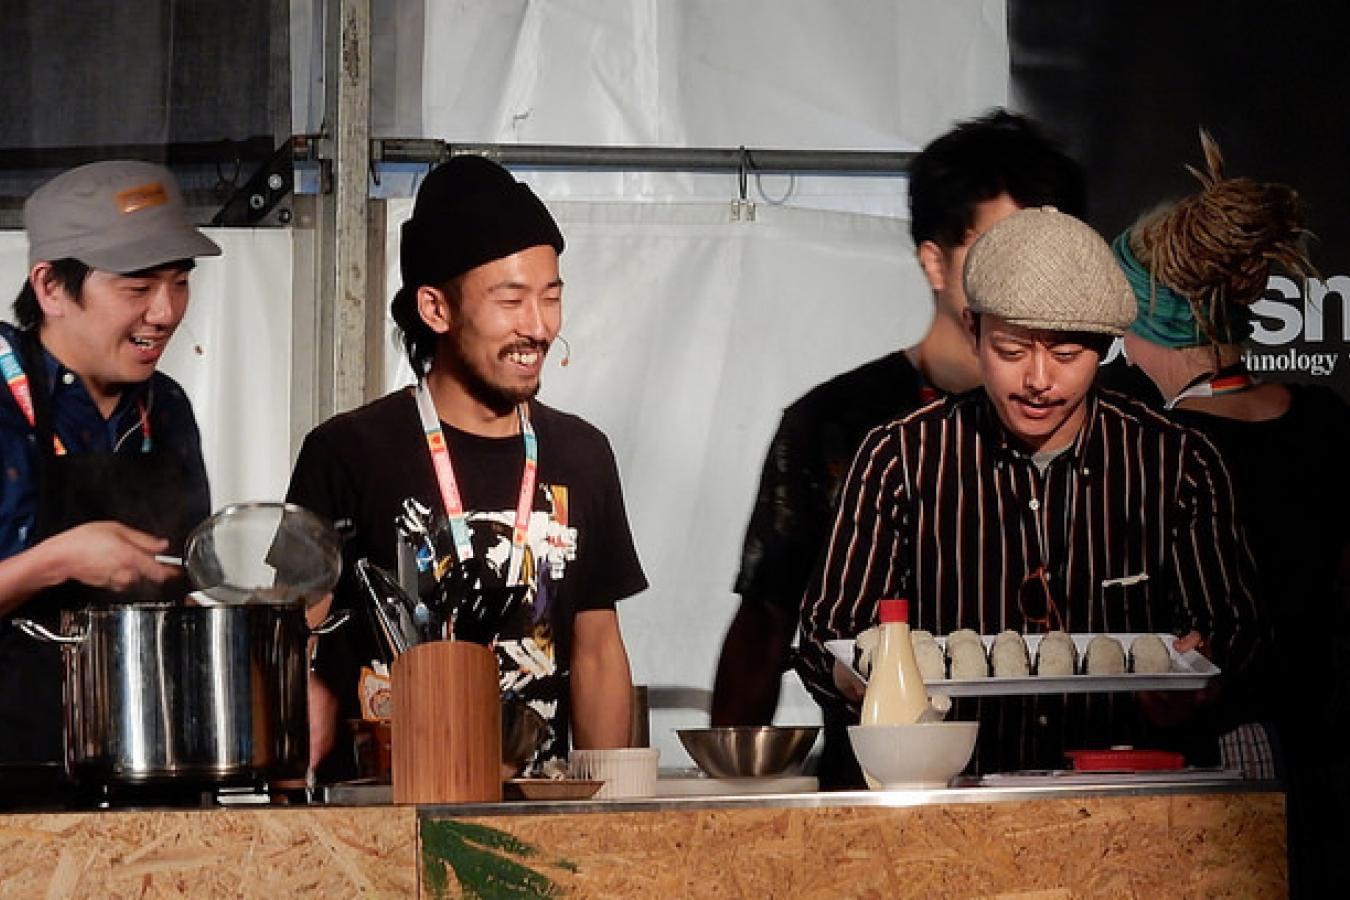 Asian chefs